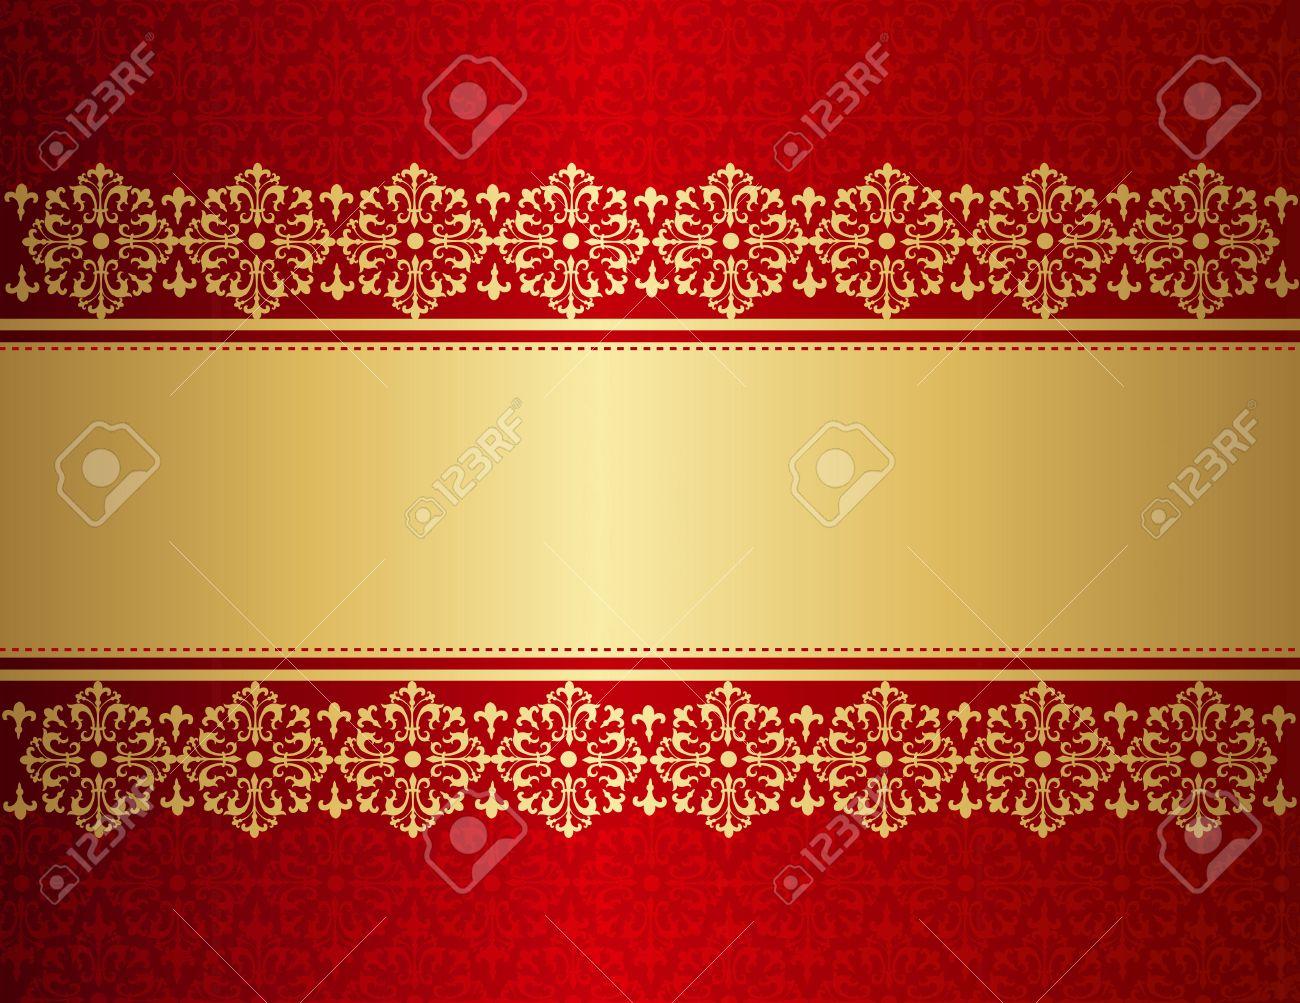 Elegant Wedding Invitation Anniversary Background Frame Design